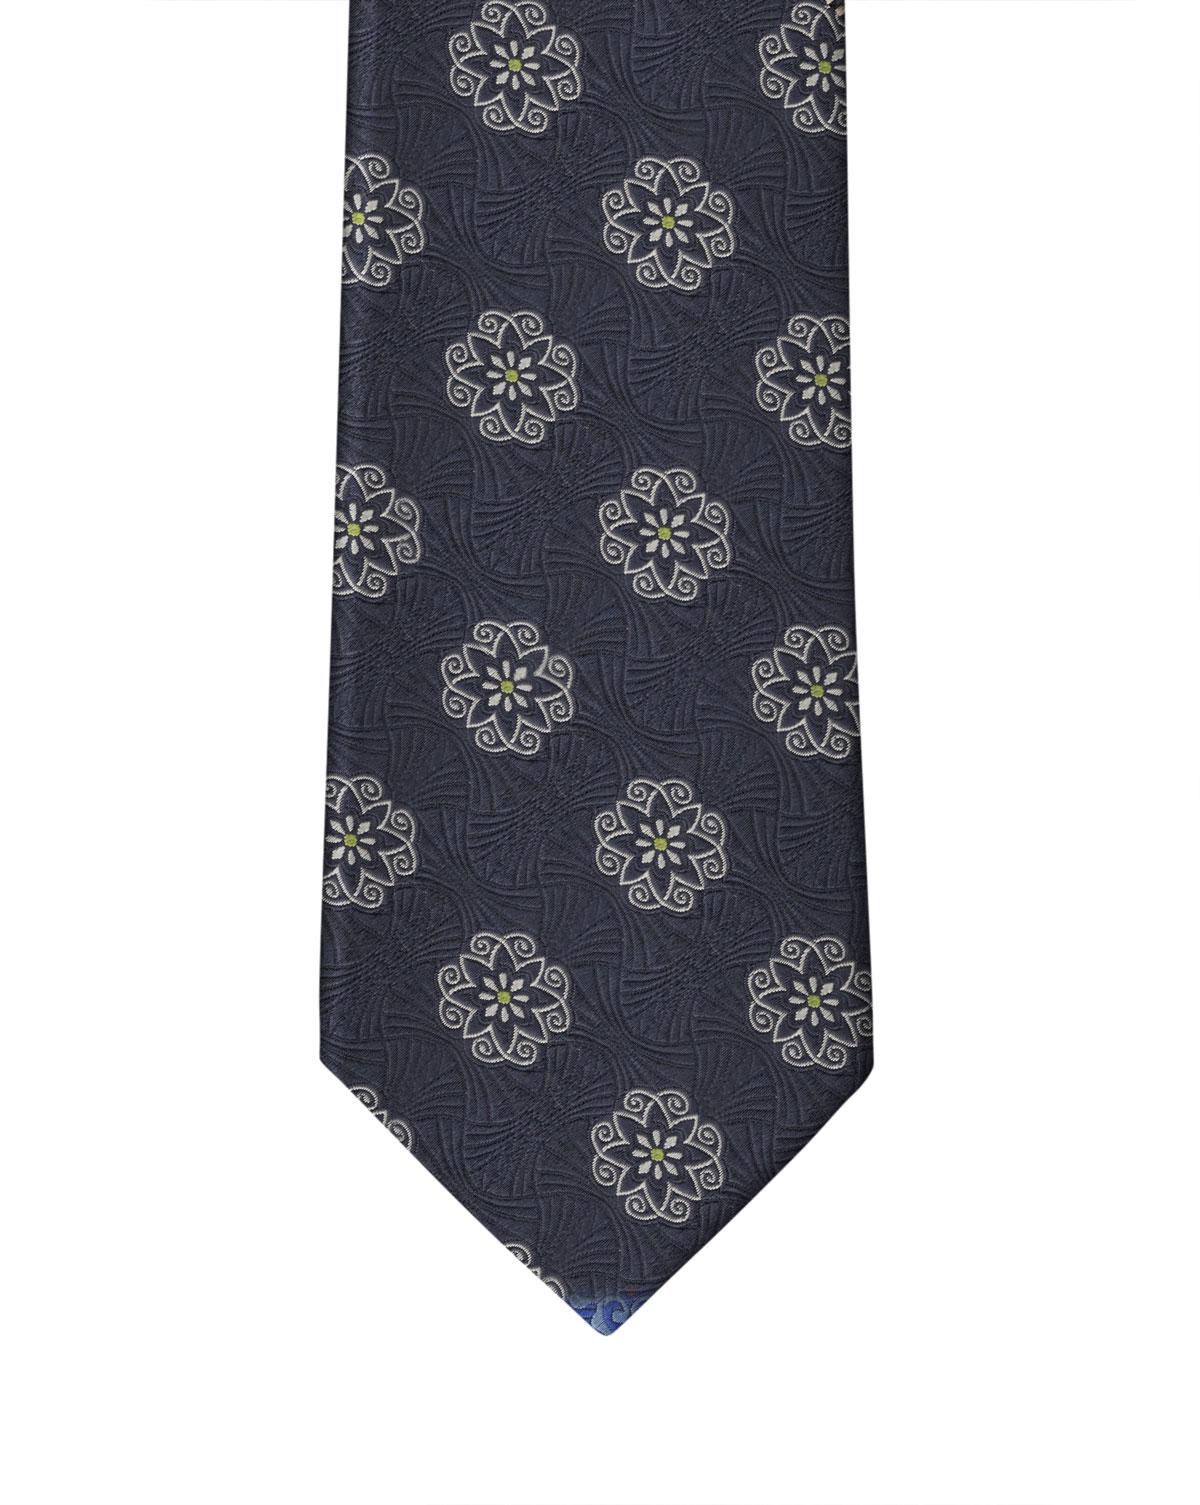 Navy Heraldic Medallion Necktie